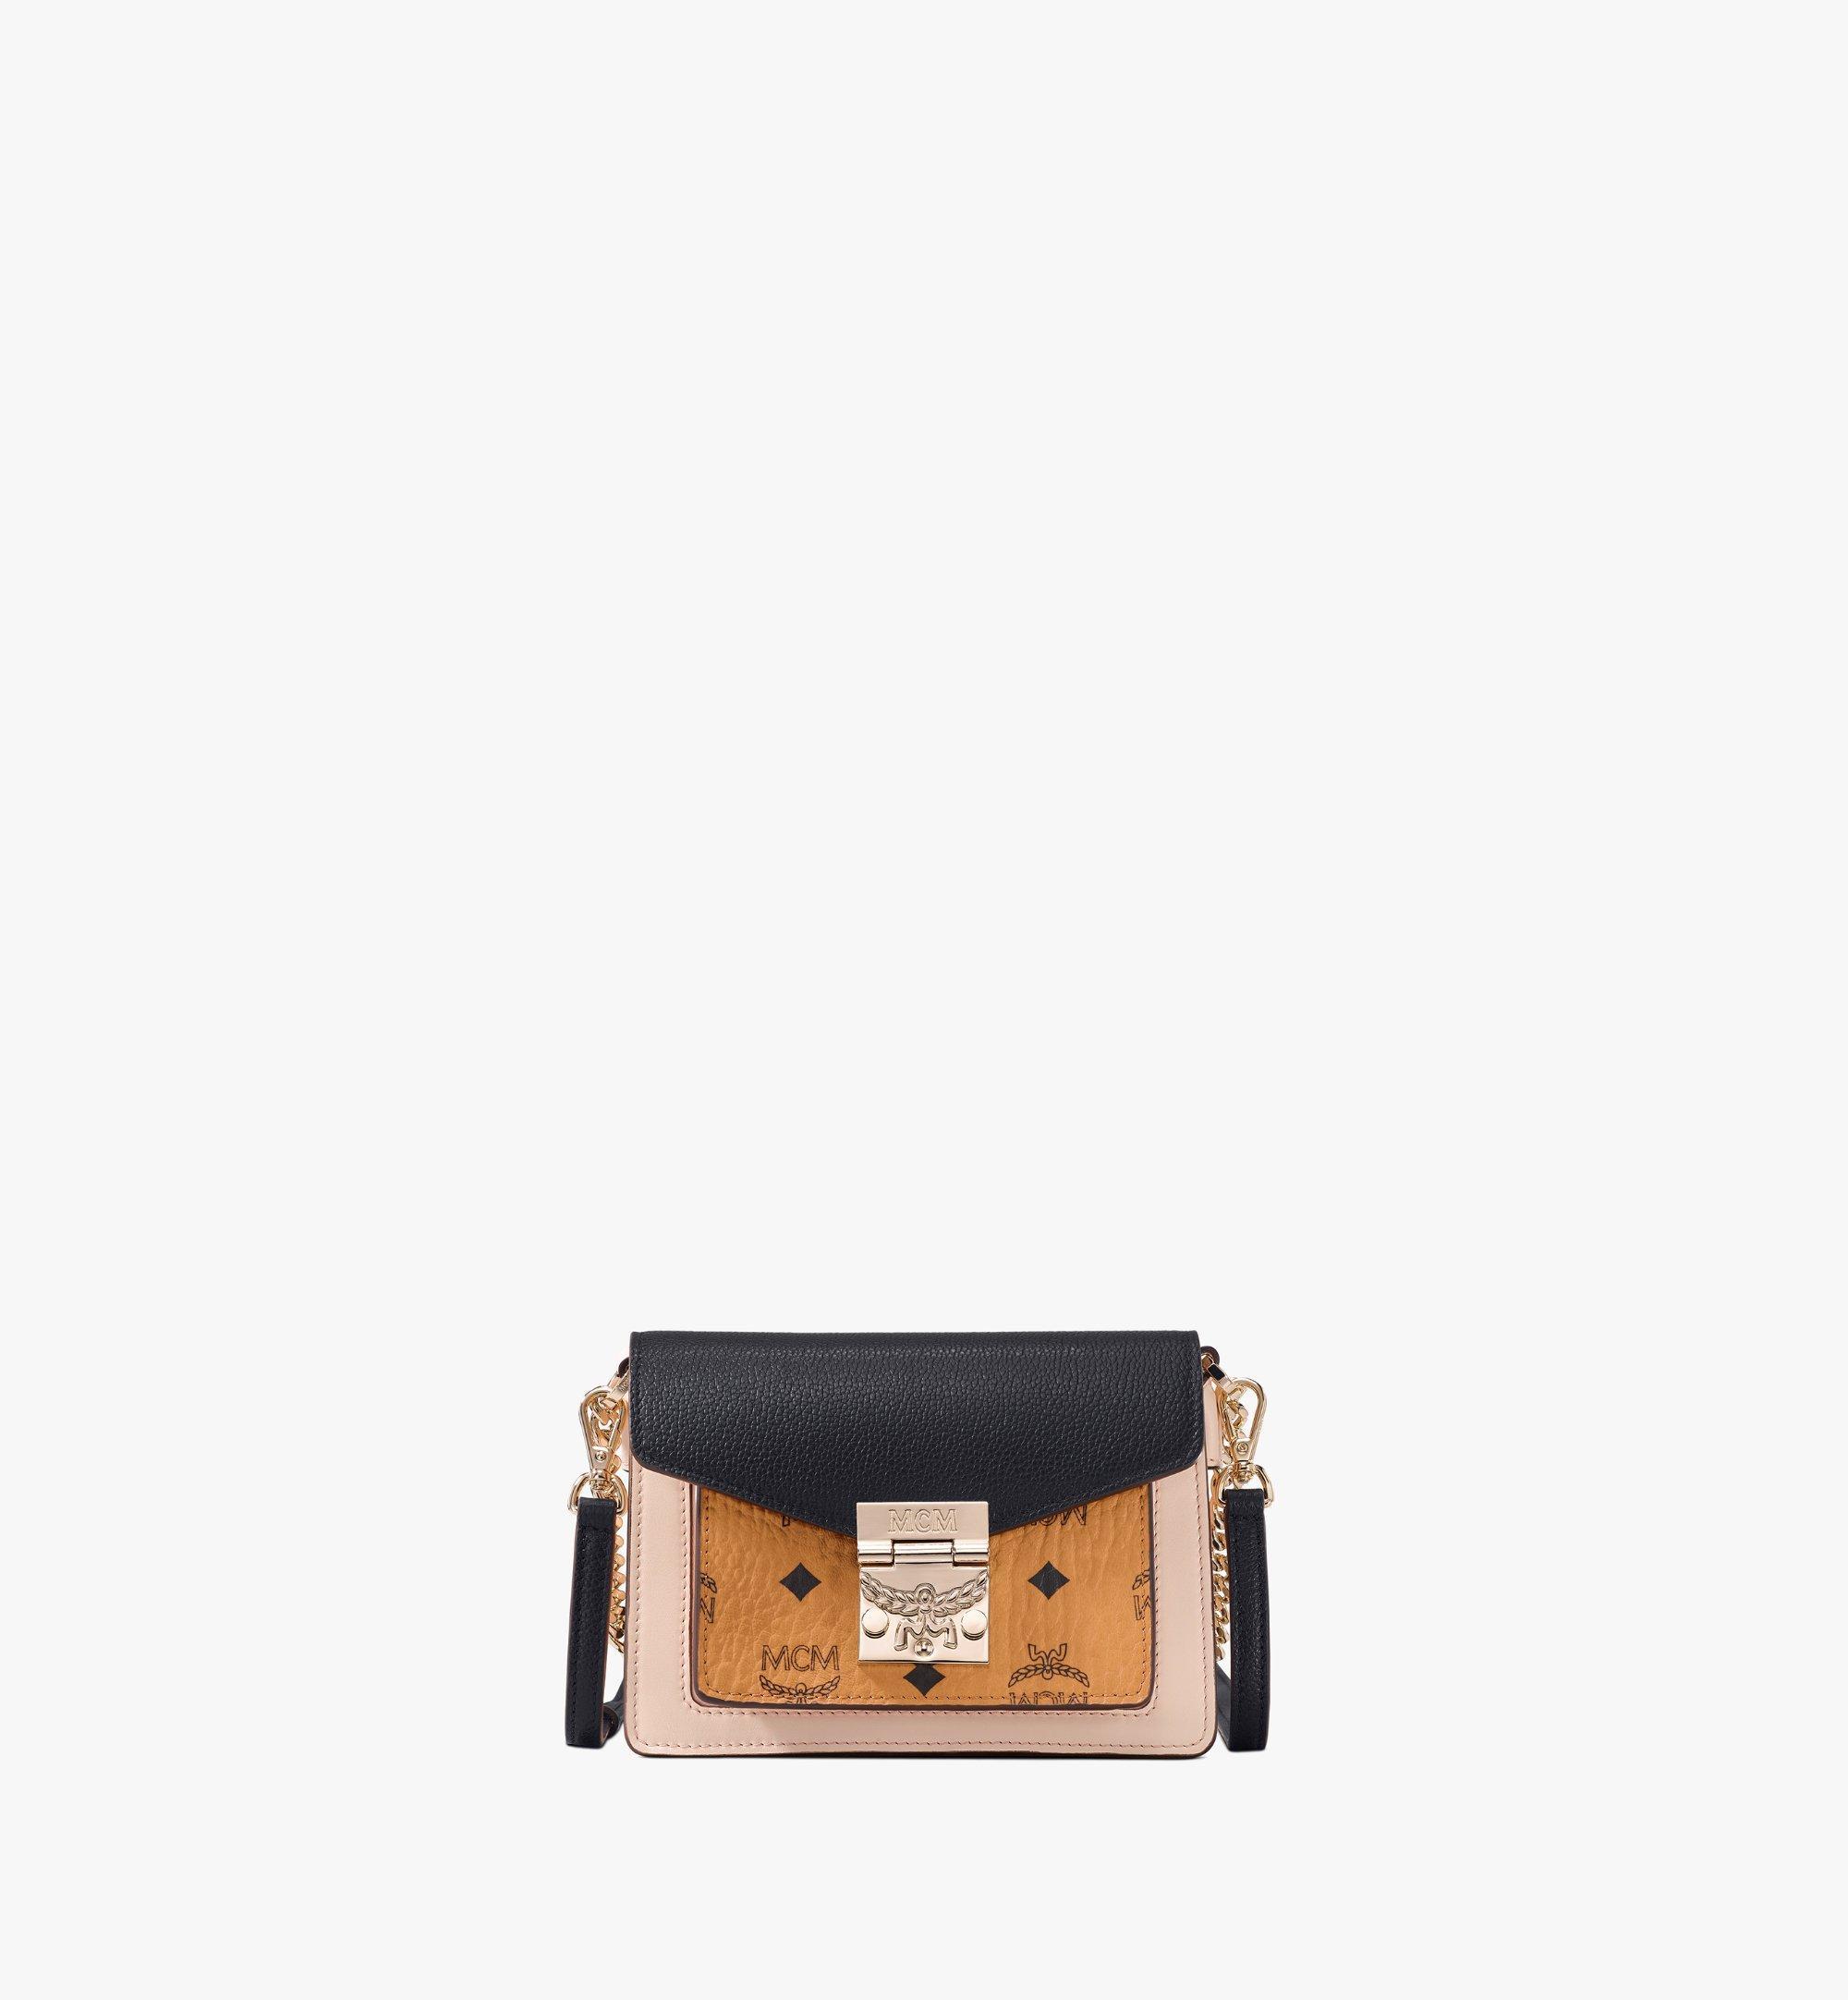 Mini Patricia Colorblock Crossbody Tasche in Visetos Black